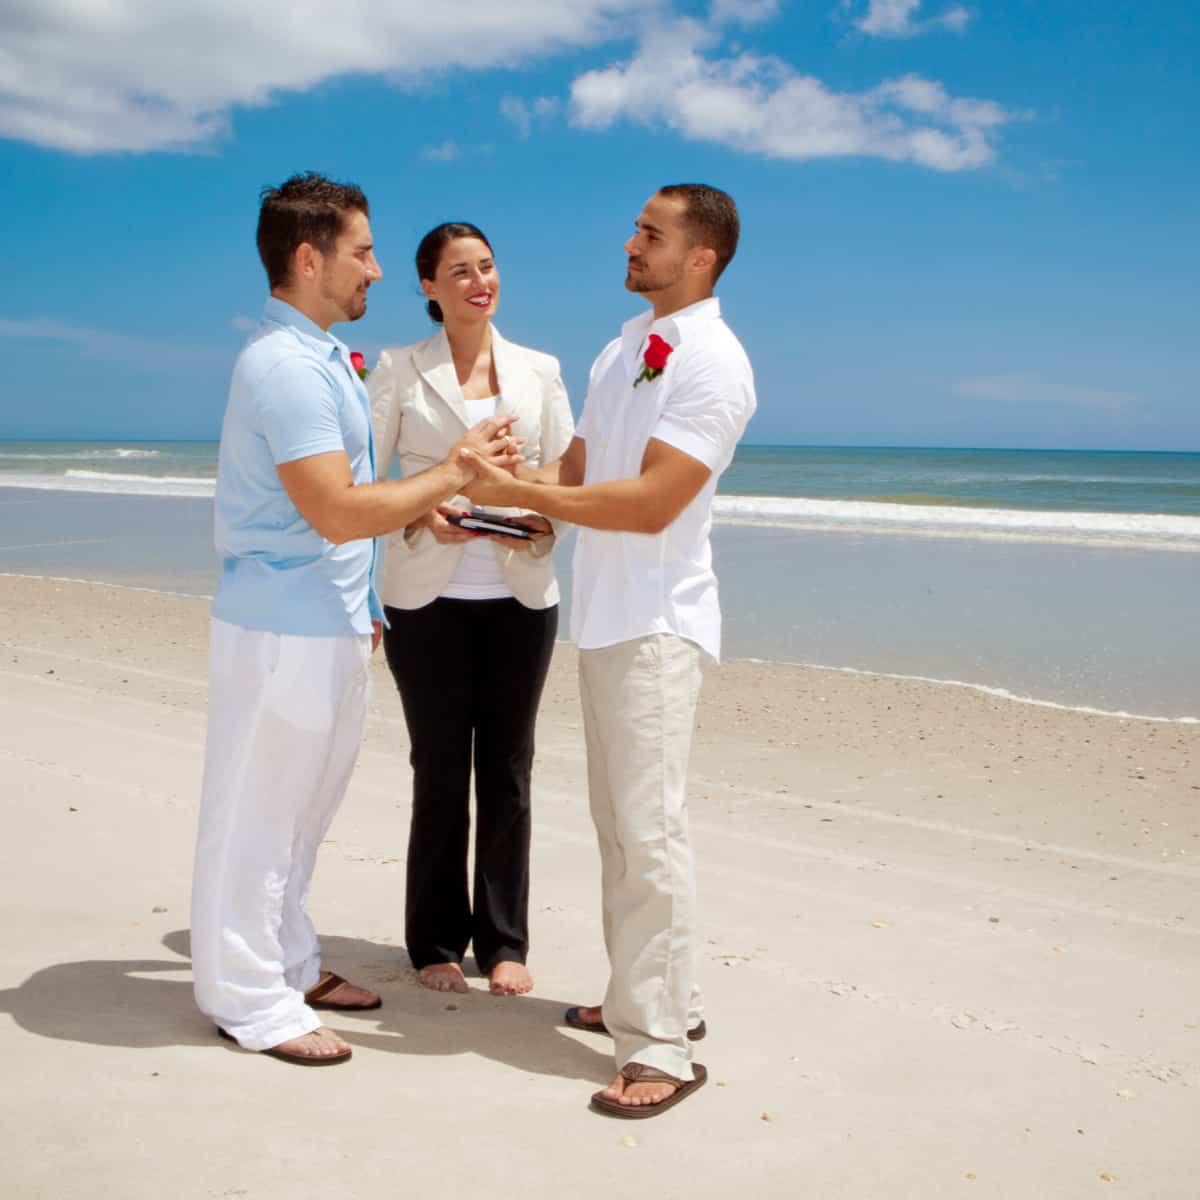 Gay wedding on the beach